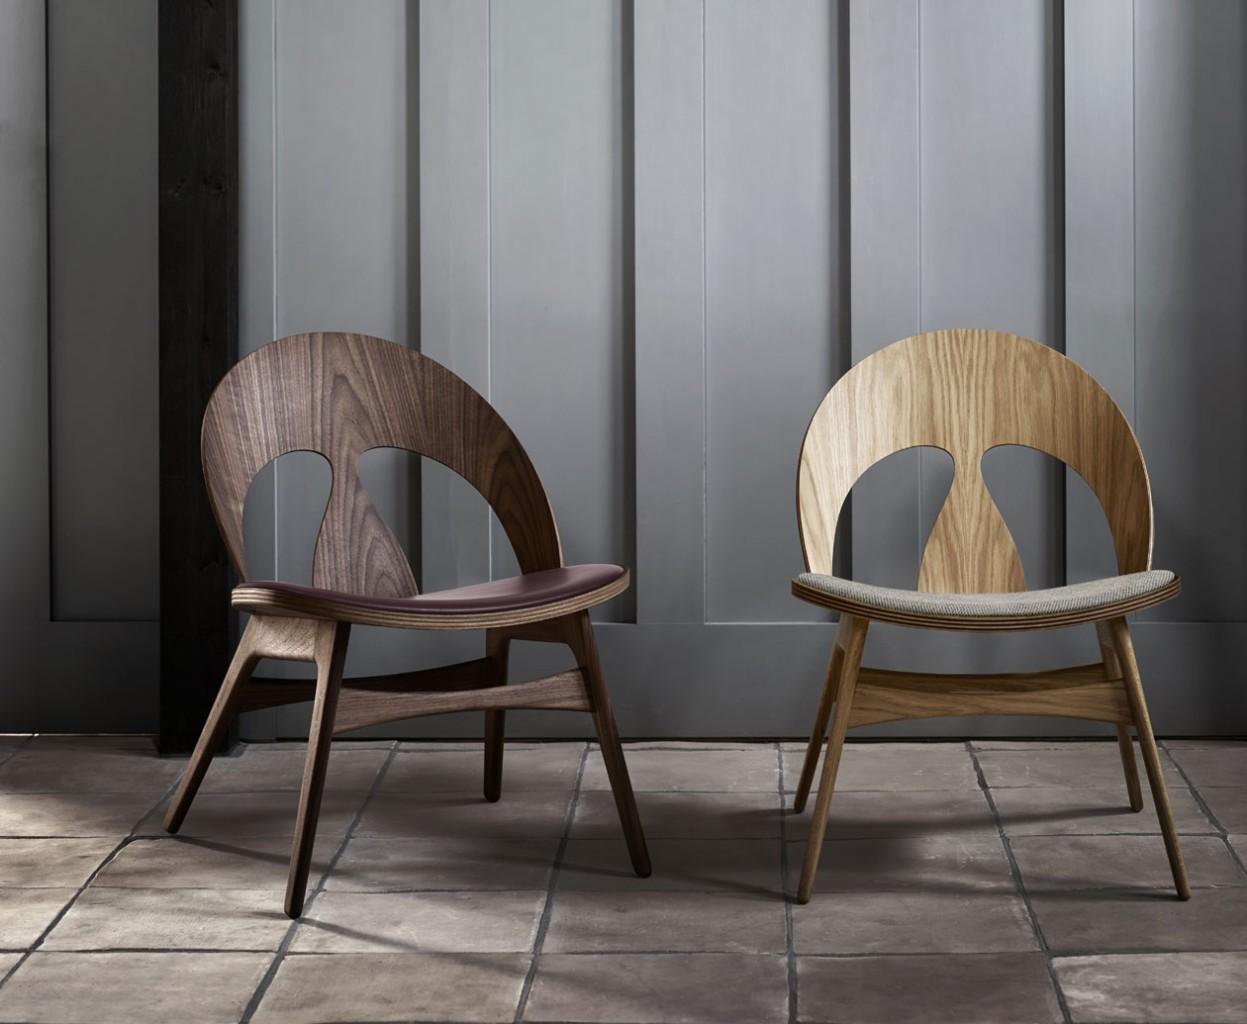 carl-hansen-Contour-chair-BM0949-walnut-oil-sif93-oak-oil-molly116